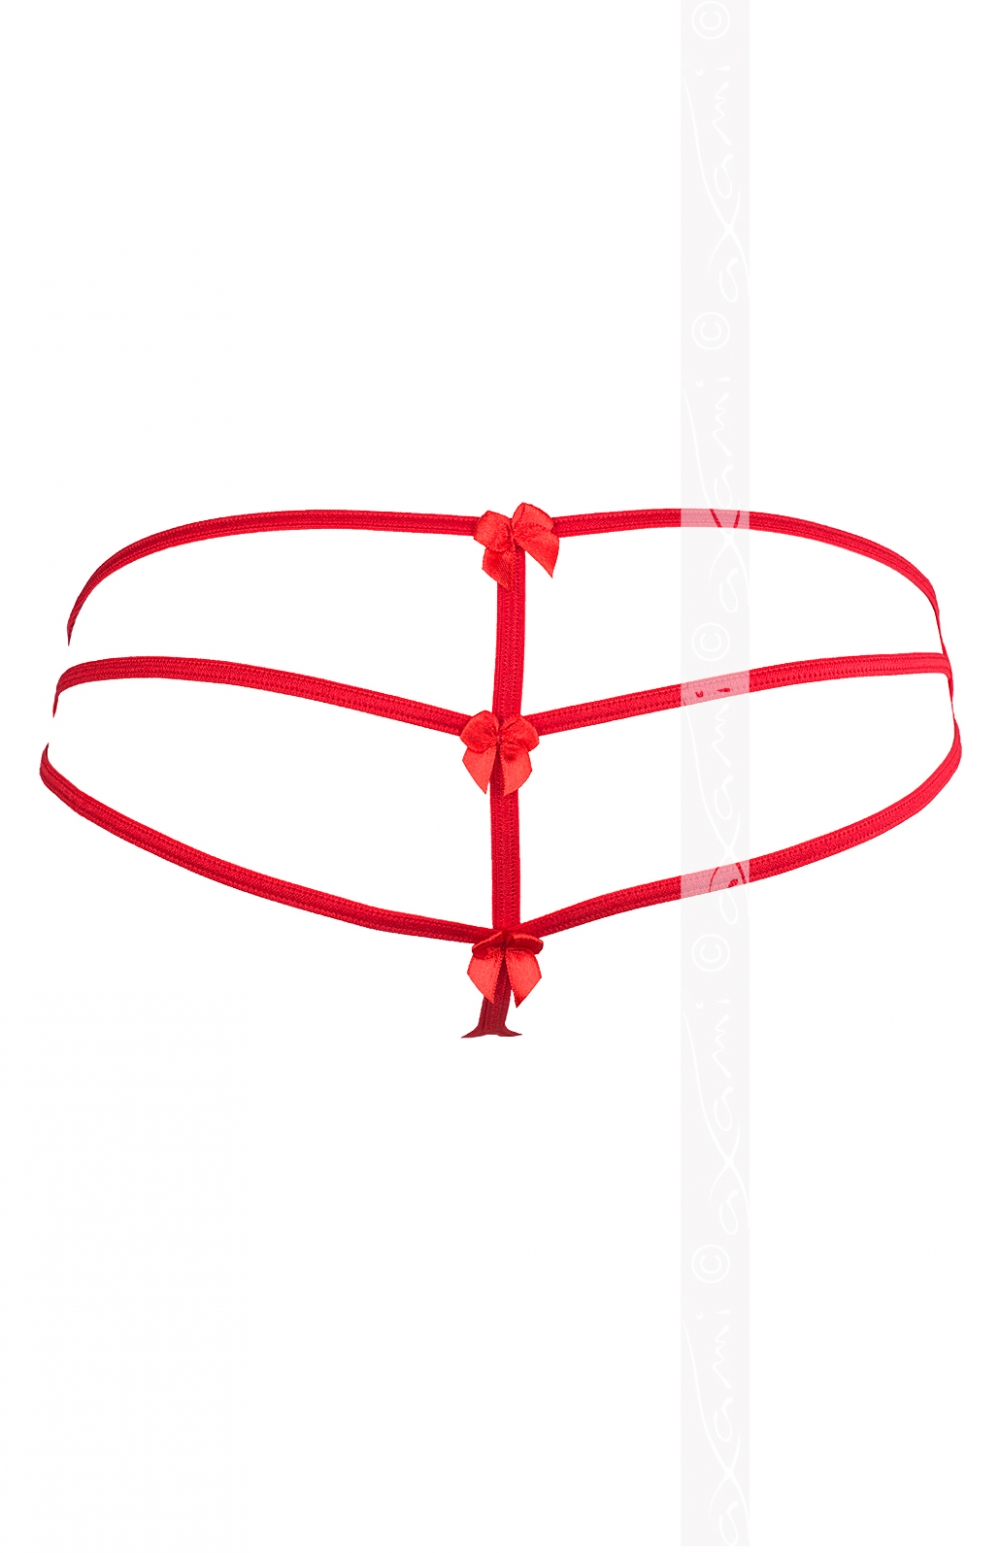 String V-5848 Cassiopea